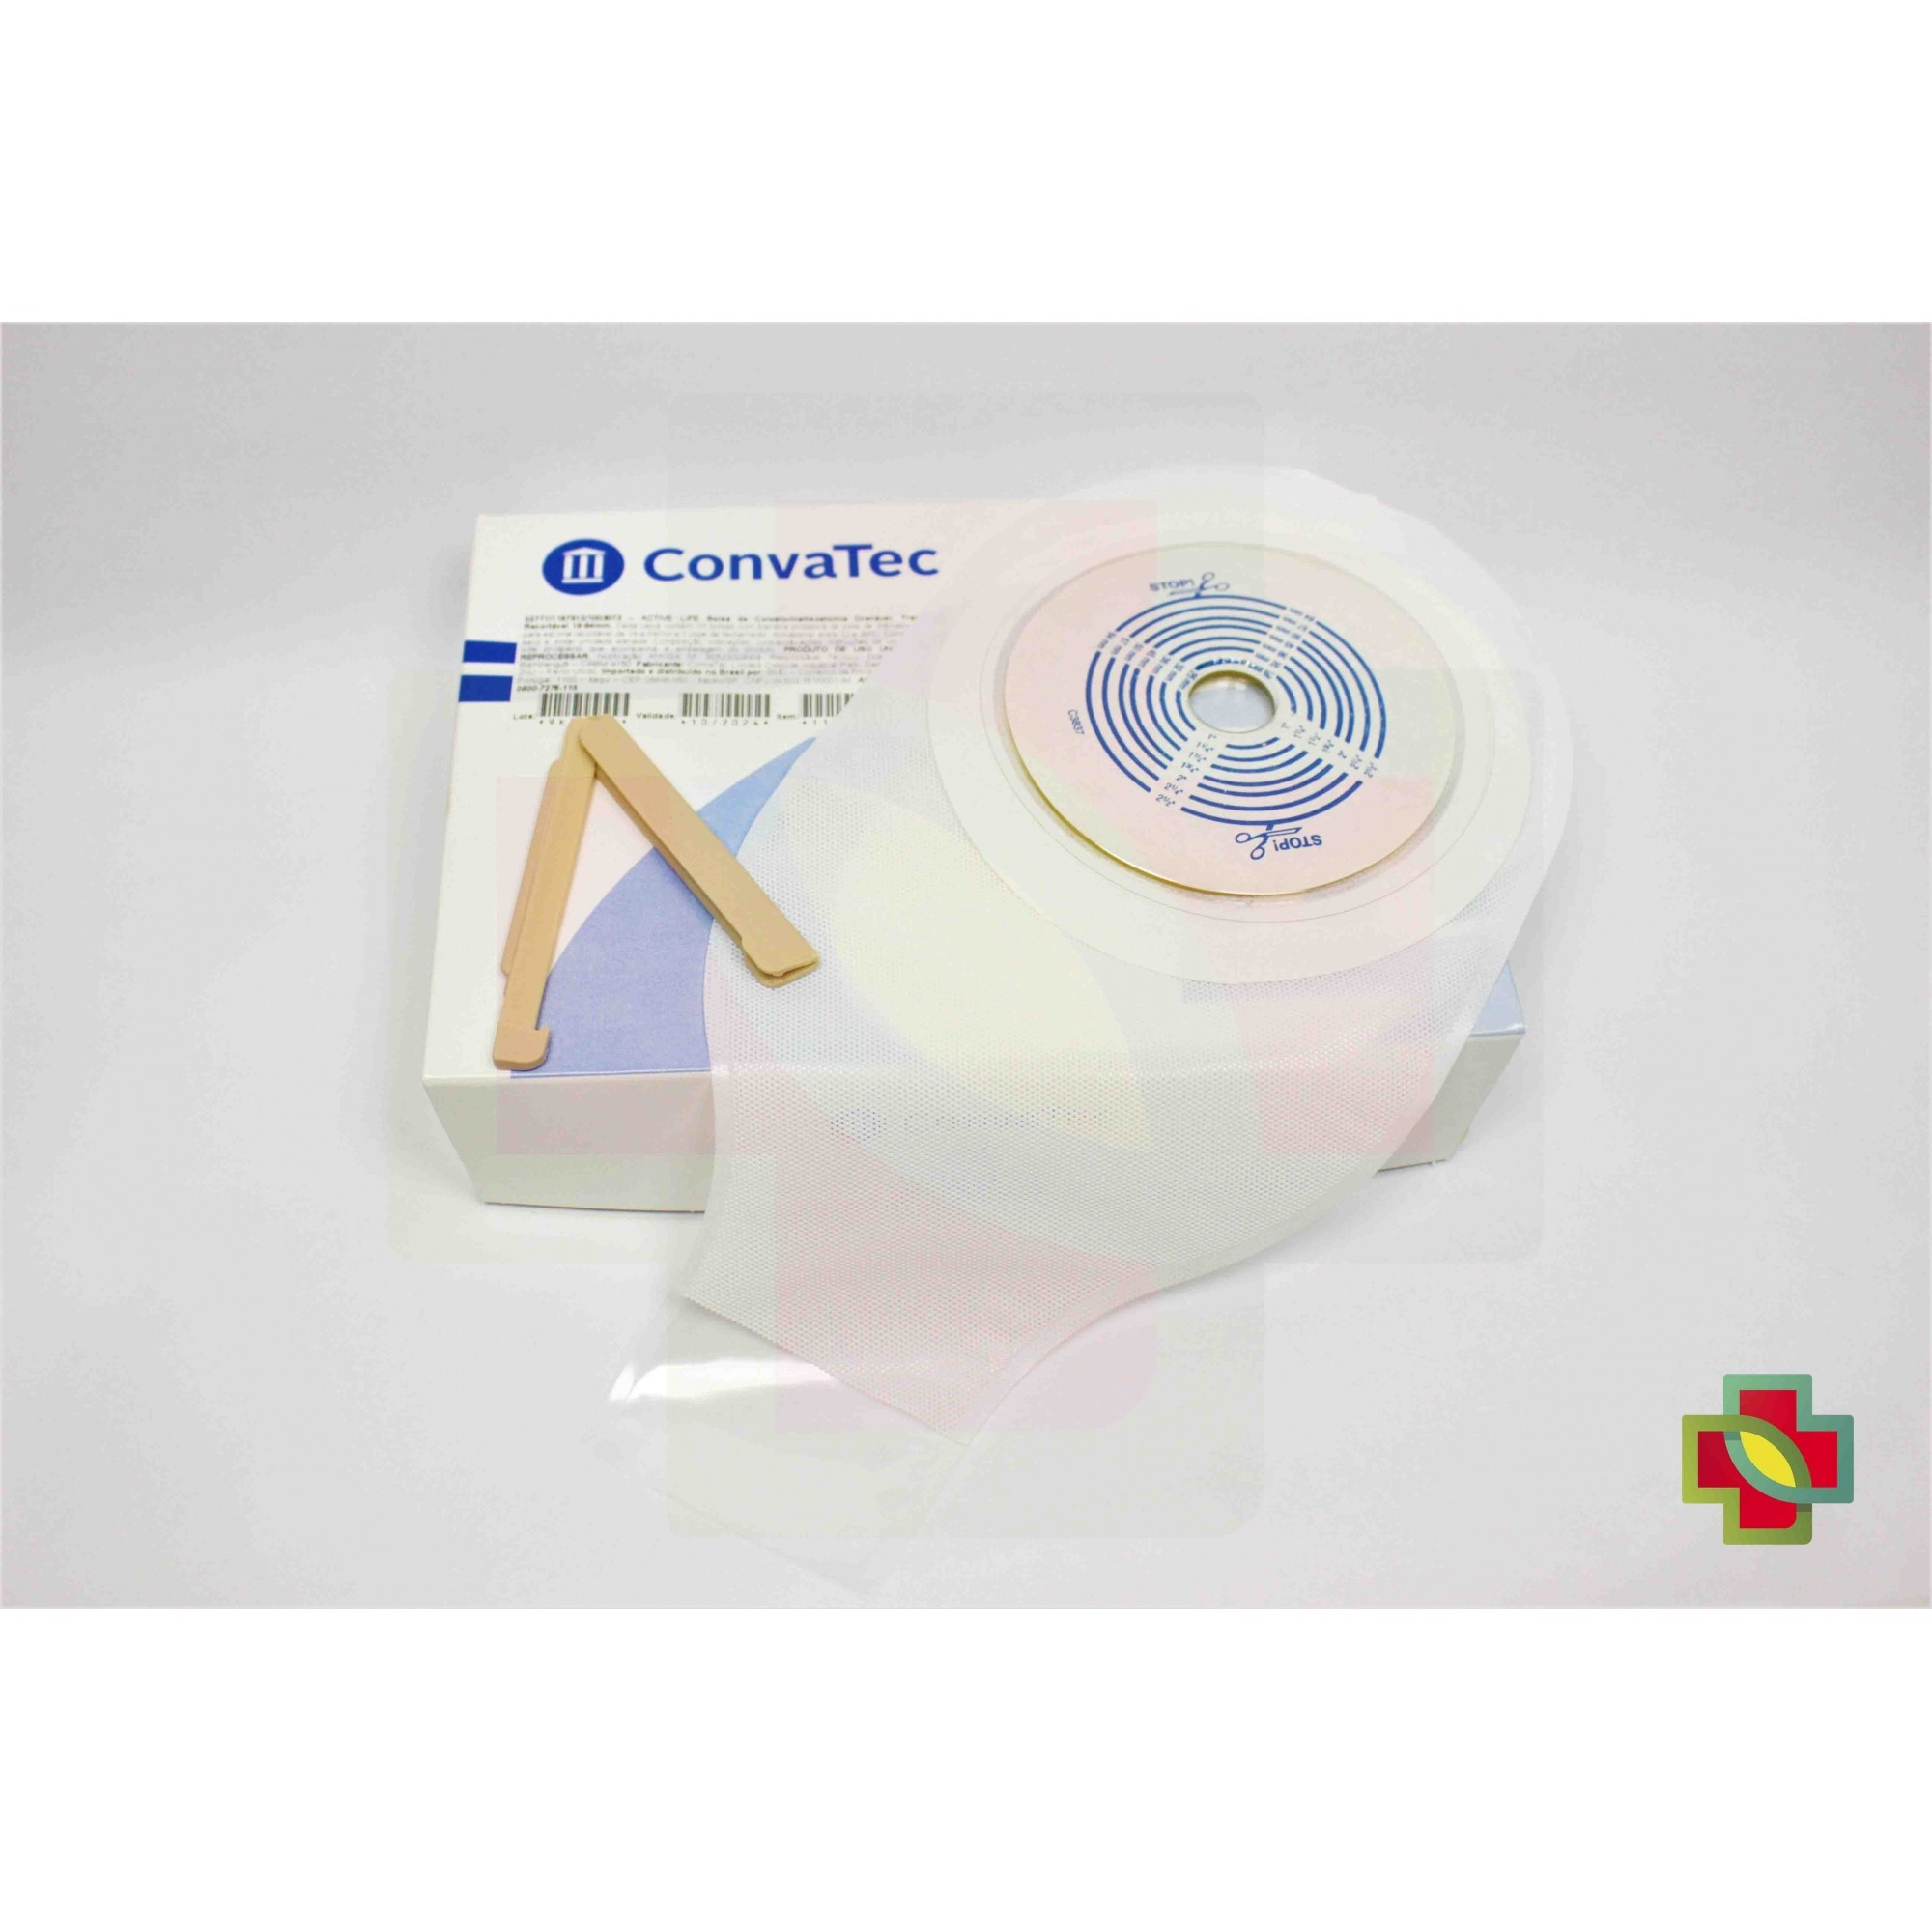 BOLSA DE COLOSTOMIA ACTIVE-LIFE TRANSPARENTE 19/64MM (CX C/ 20) - CONVATEC